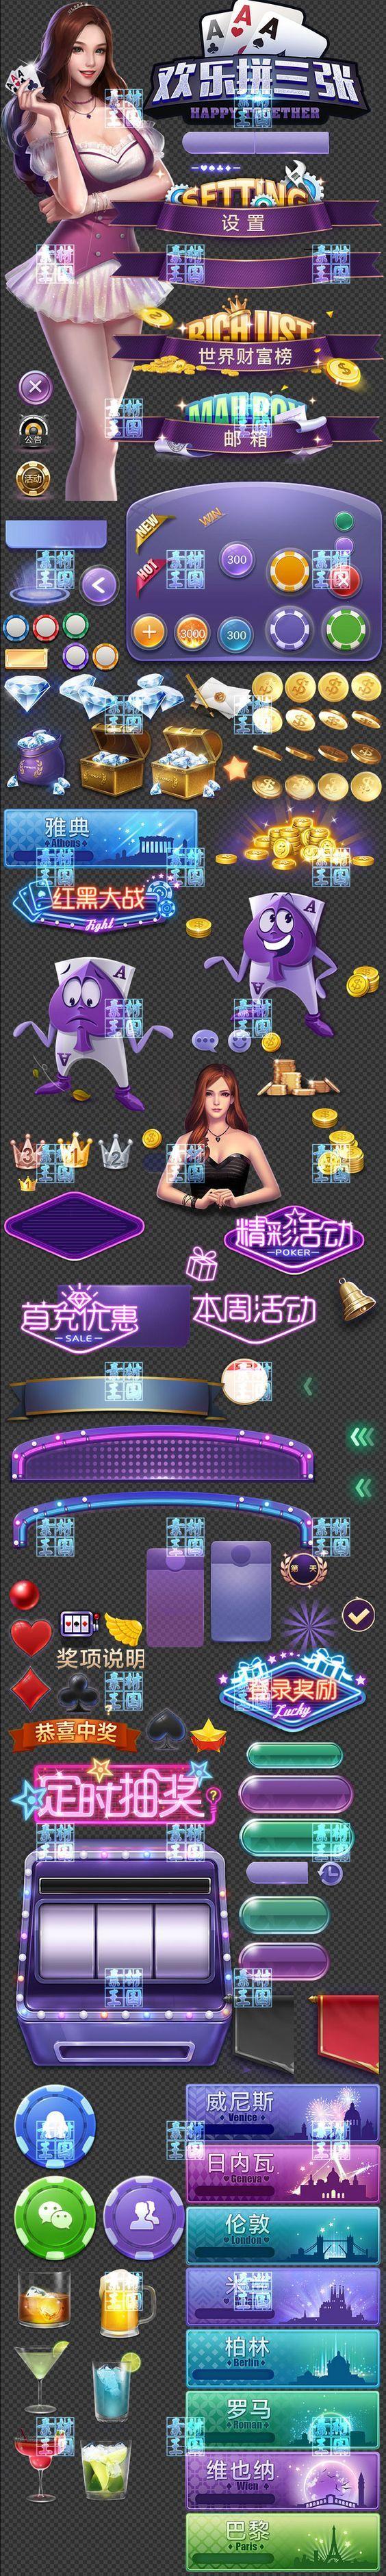 NEW欢乐拼三张/棋牌扑克赌博娱乐类/游...: